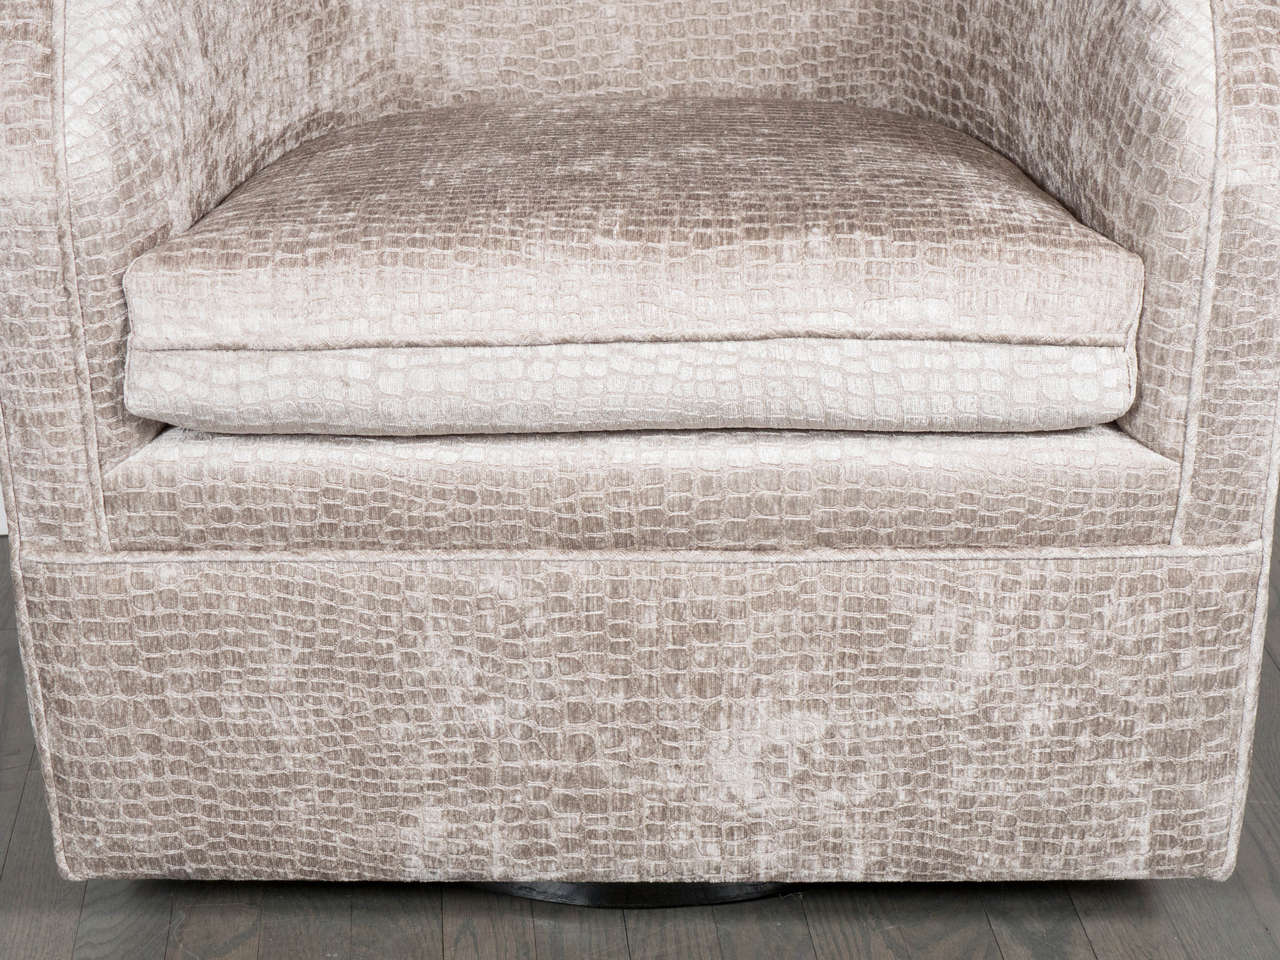 American Mid-Century Modernist Swivel Chair by Milo Baughman in Crocodile Velvet For Sale